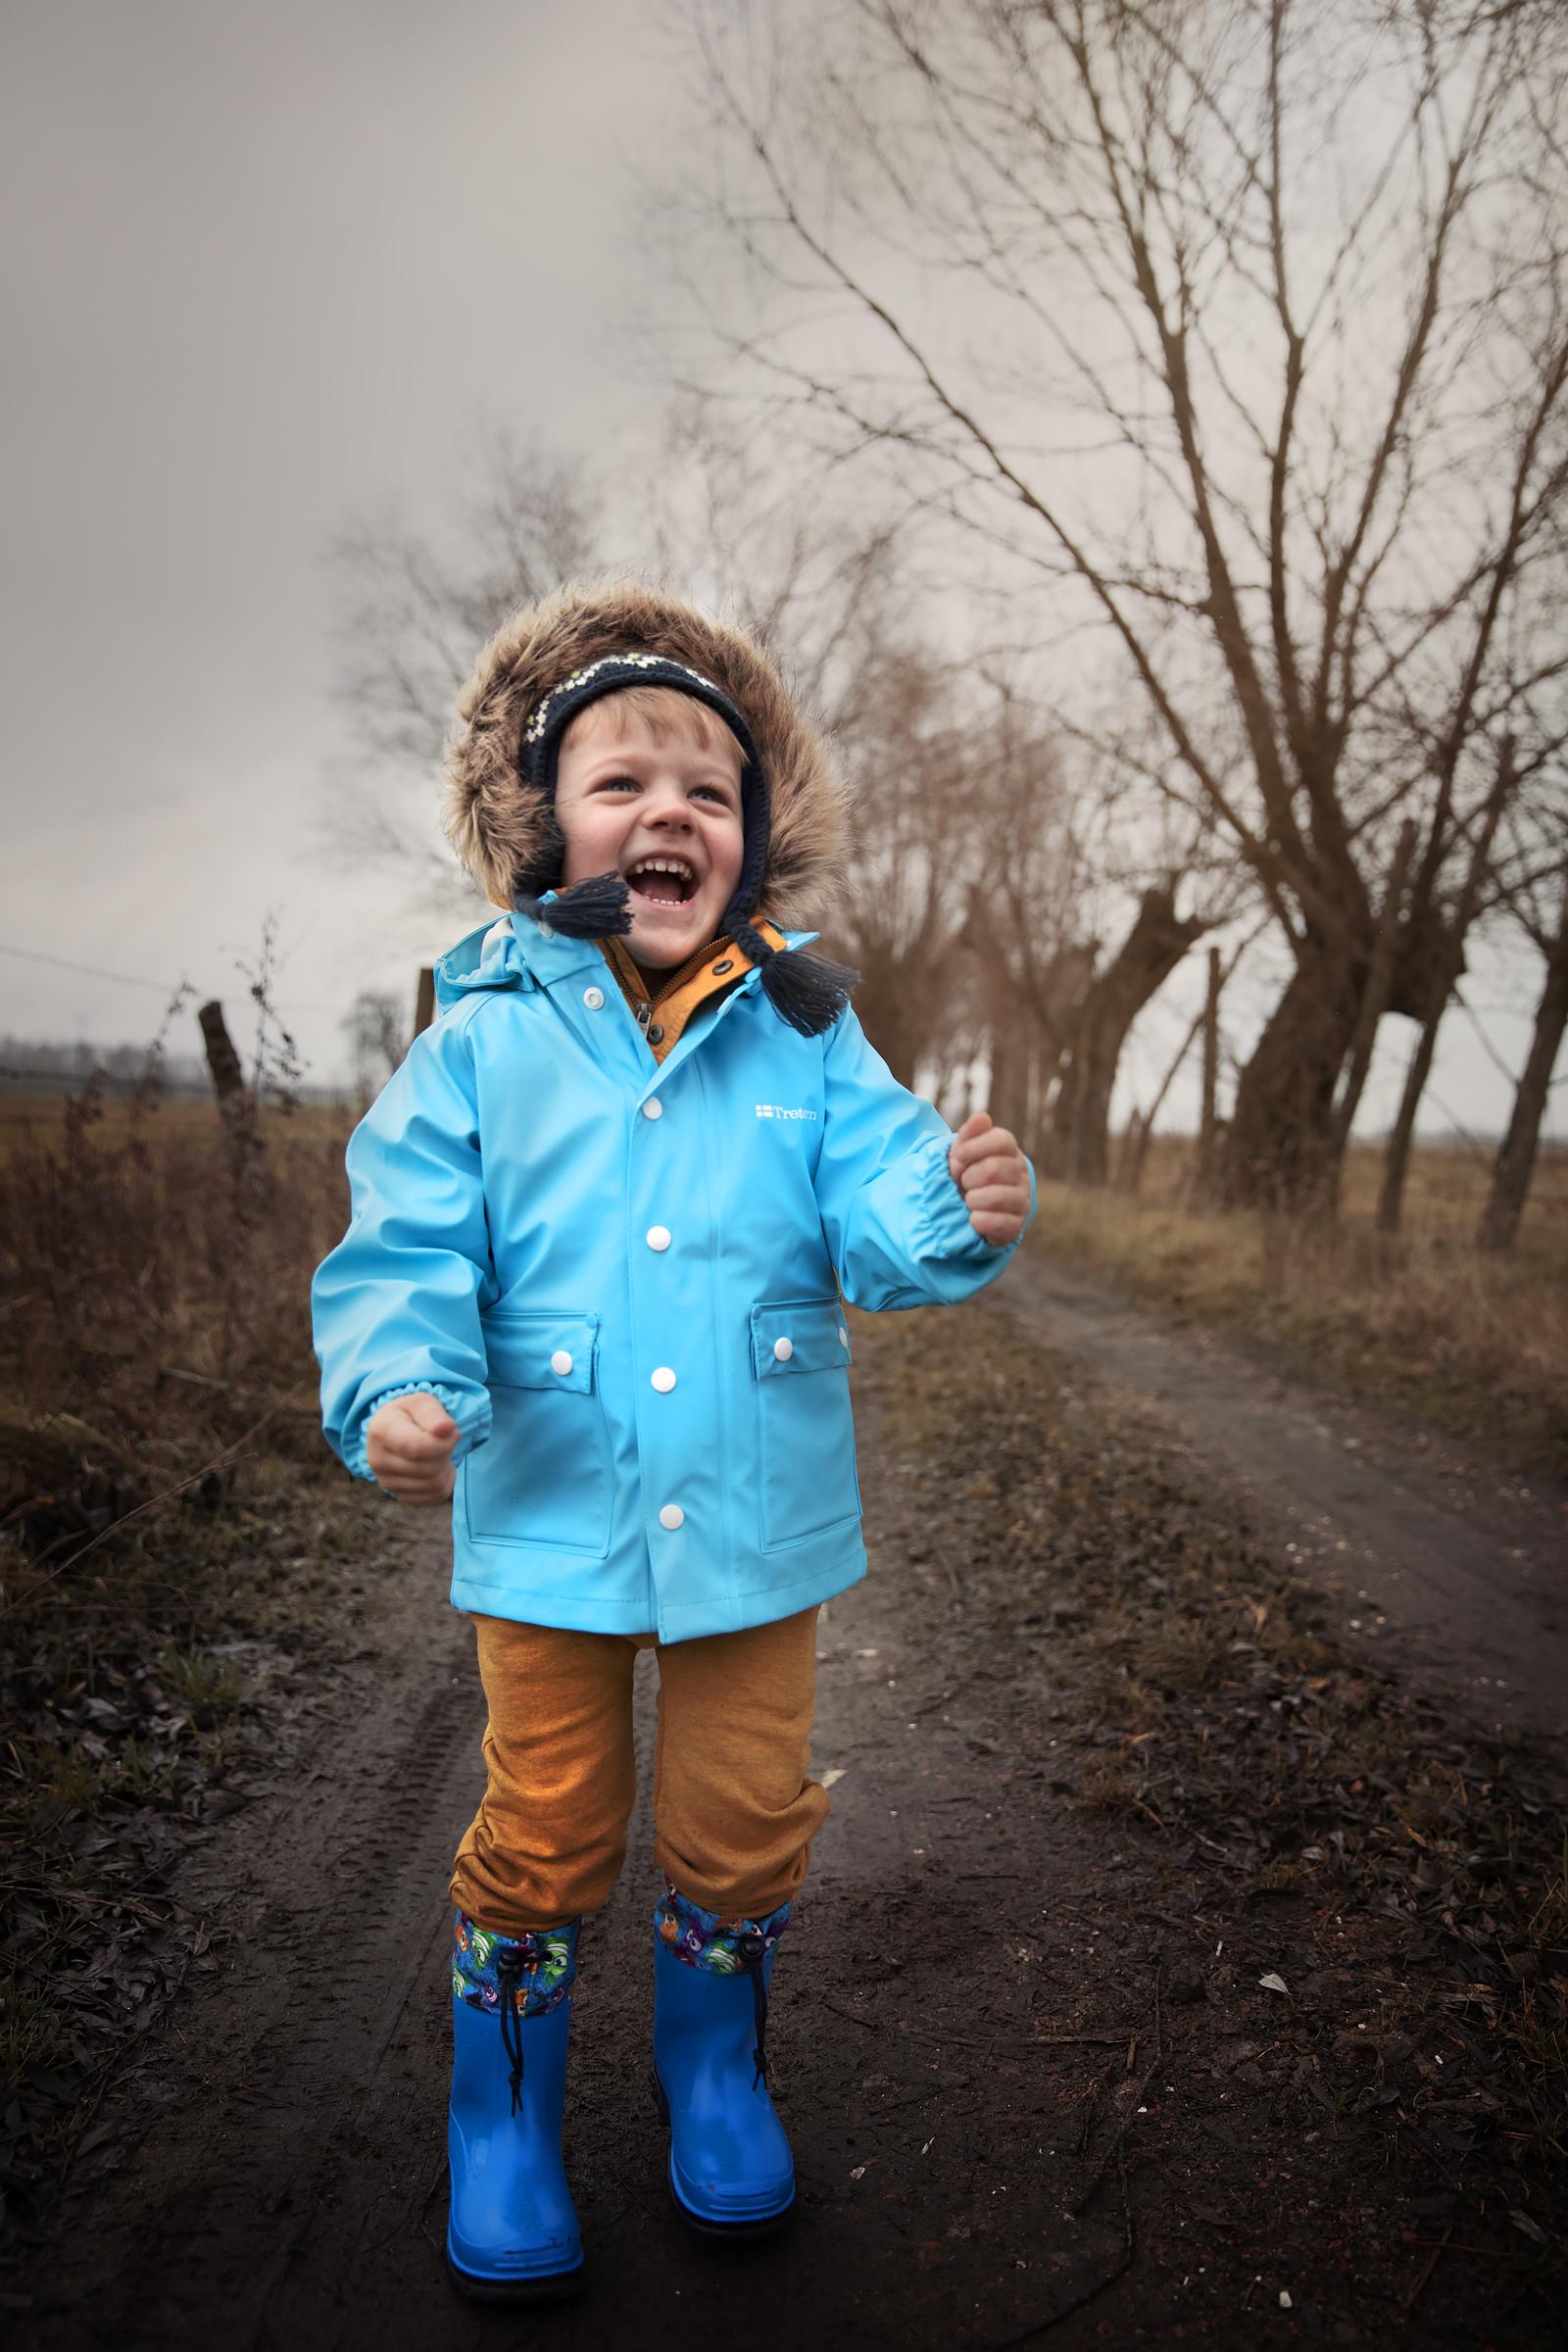 najpopularniejszy-blog-parentingowy-sanostol3